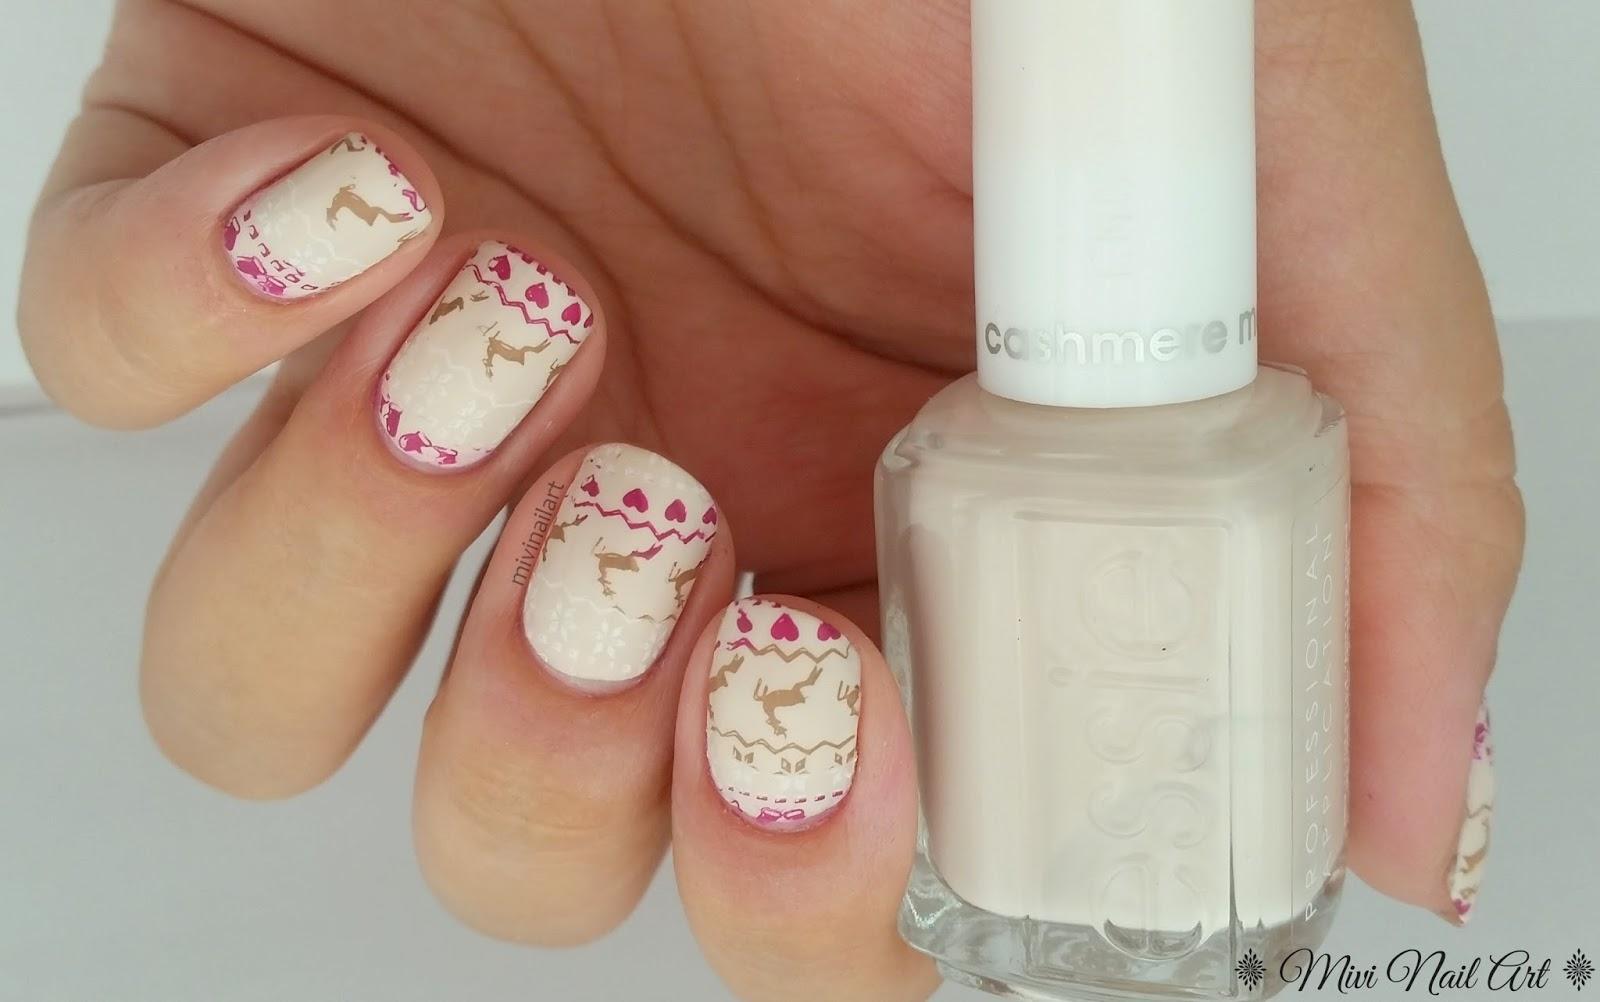 Cc Nail Salon Spa Inc